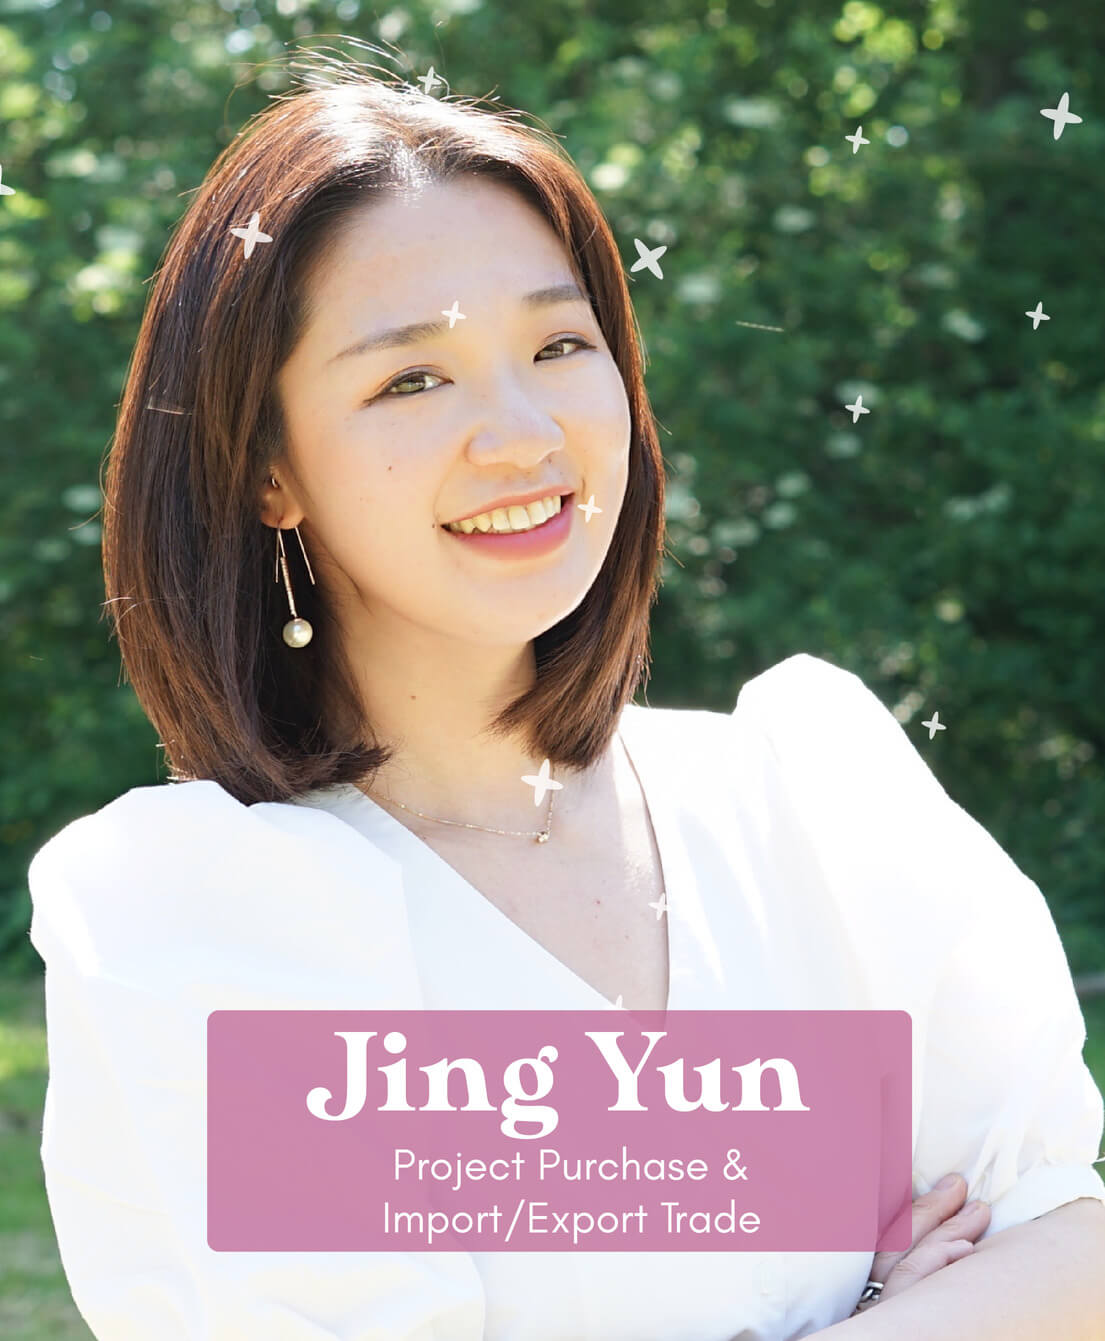 Jing Yun